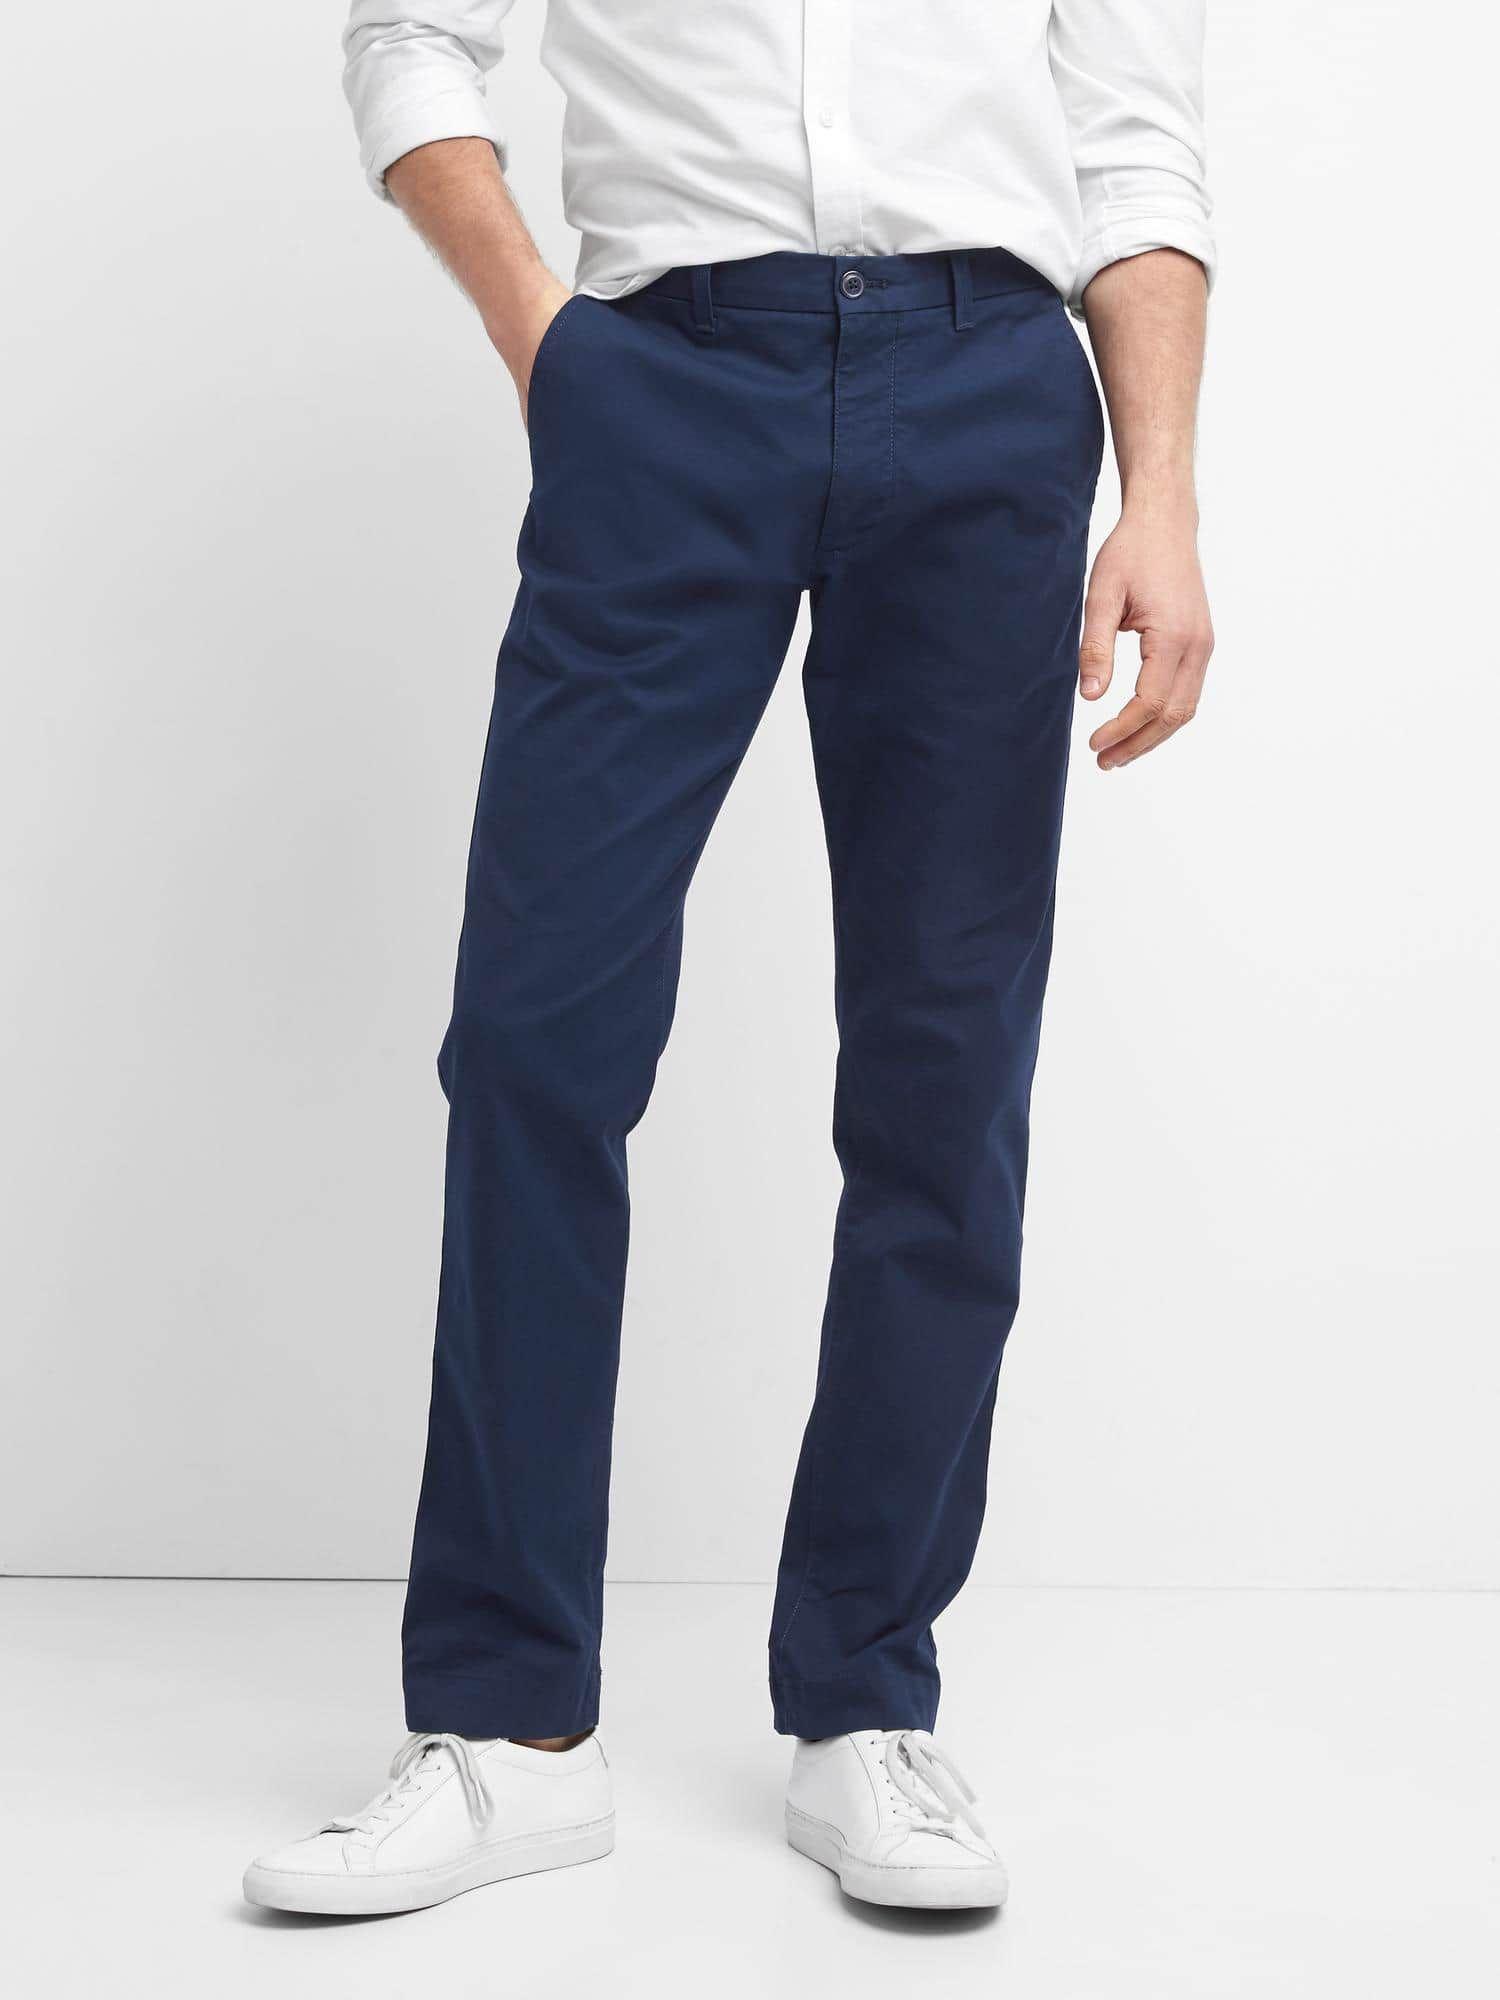 Pict j ferrar modern fit 1 - Classic Stretch Slim Fit Khakis Gap